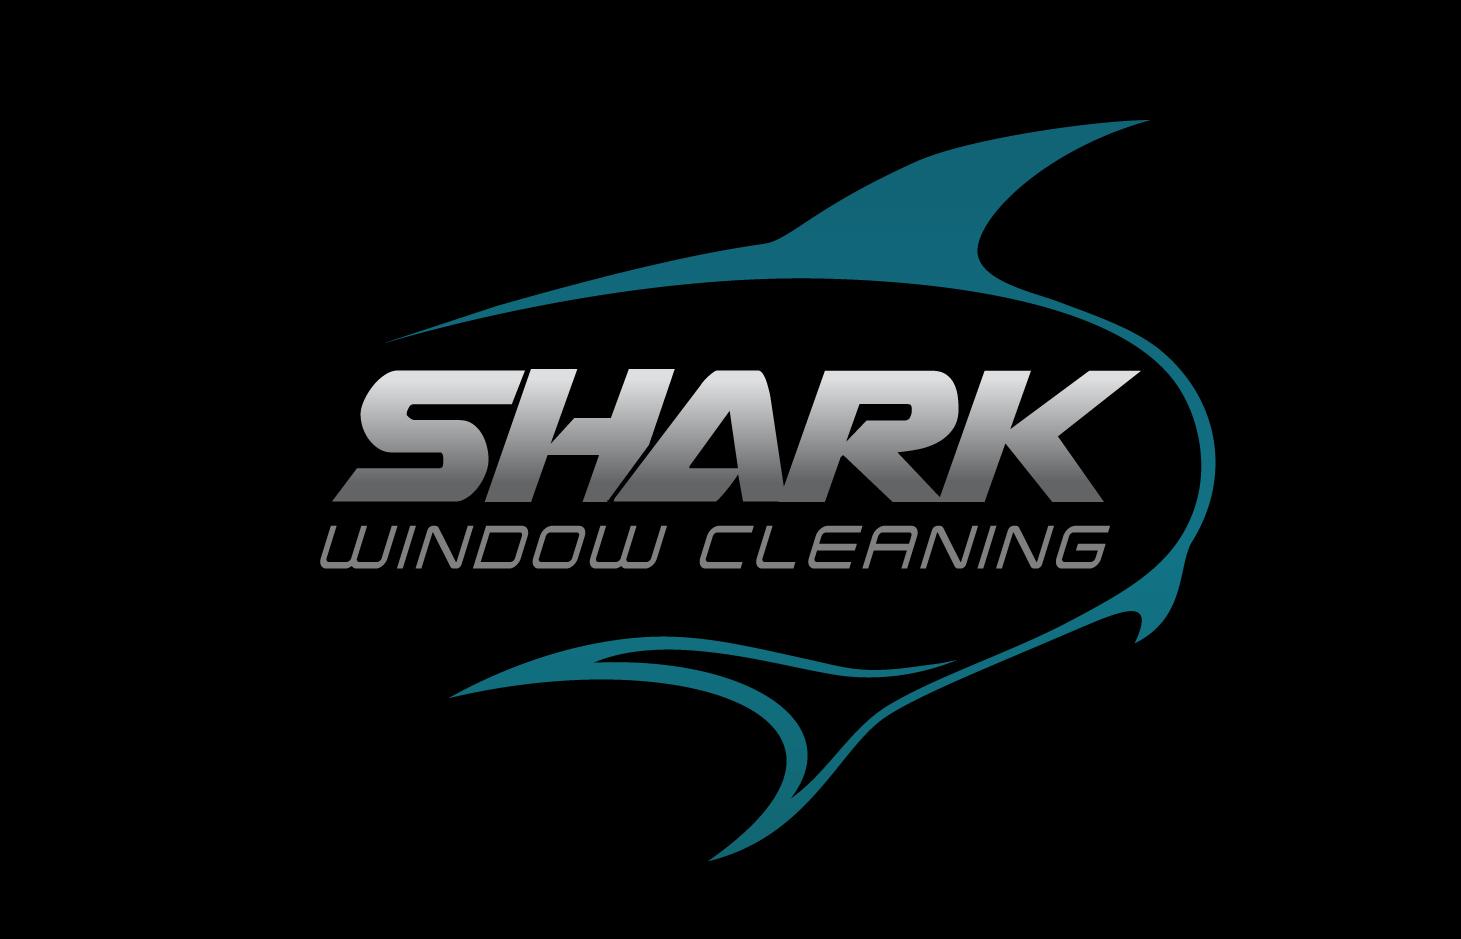 Shark Window Cleaning Zimmer Radio Amp Marketing Group